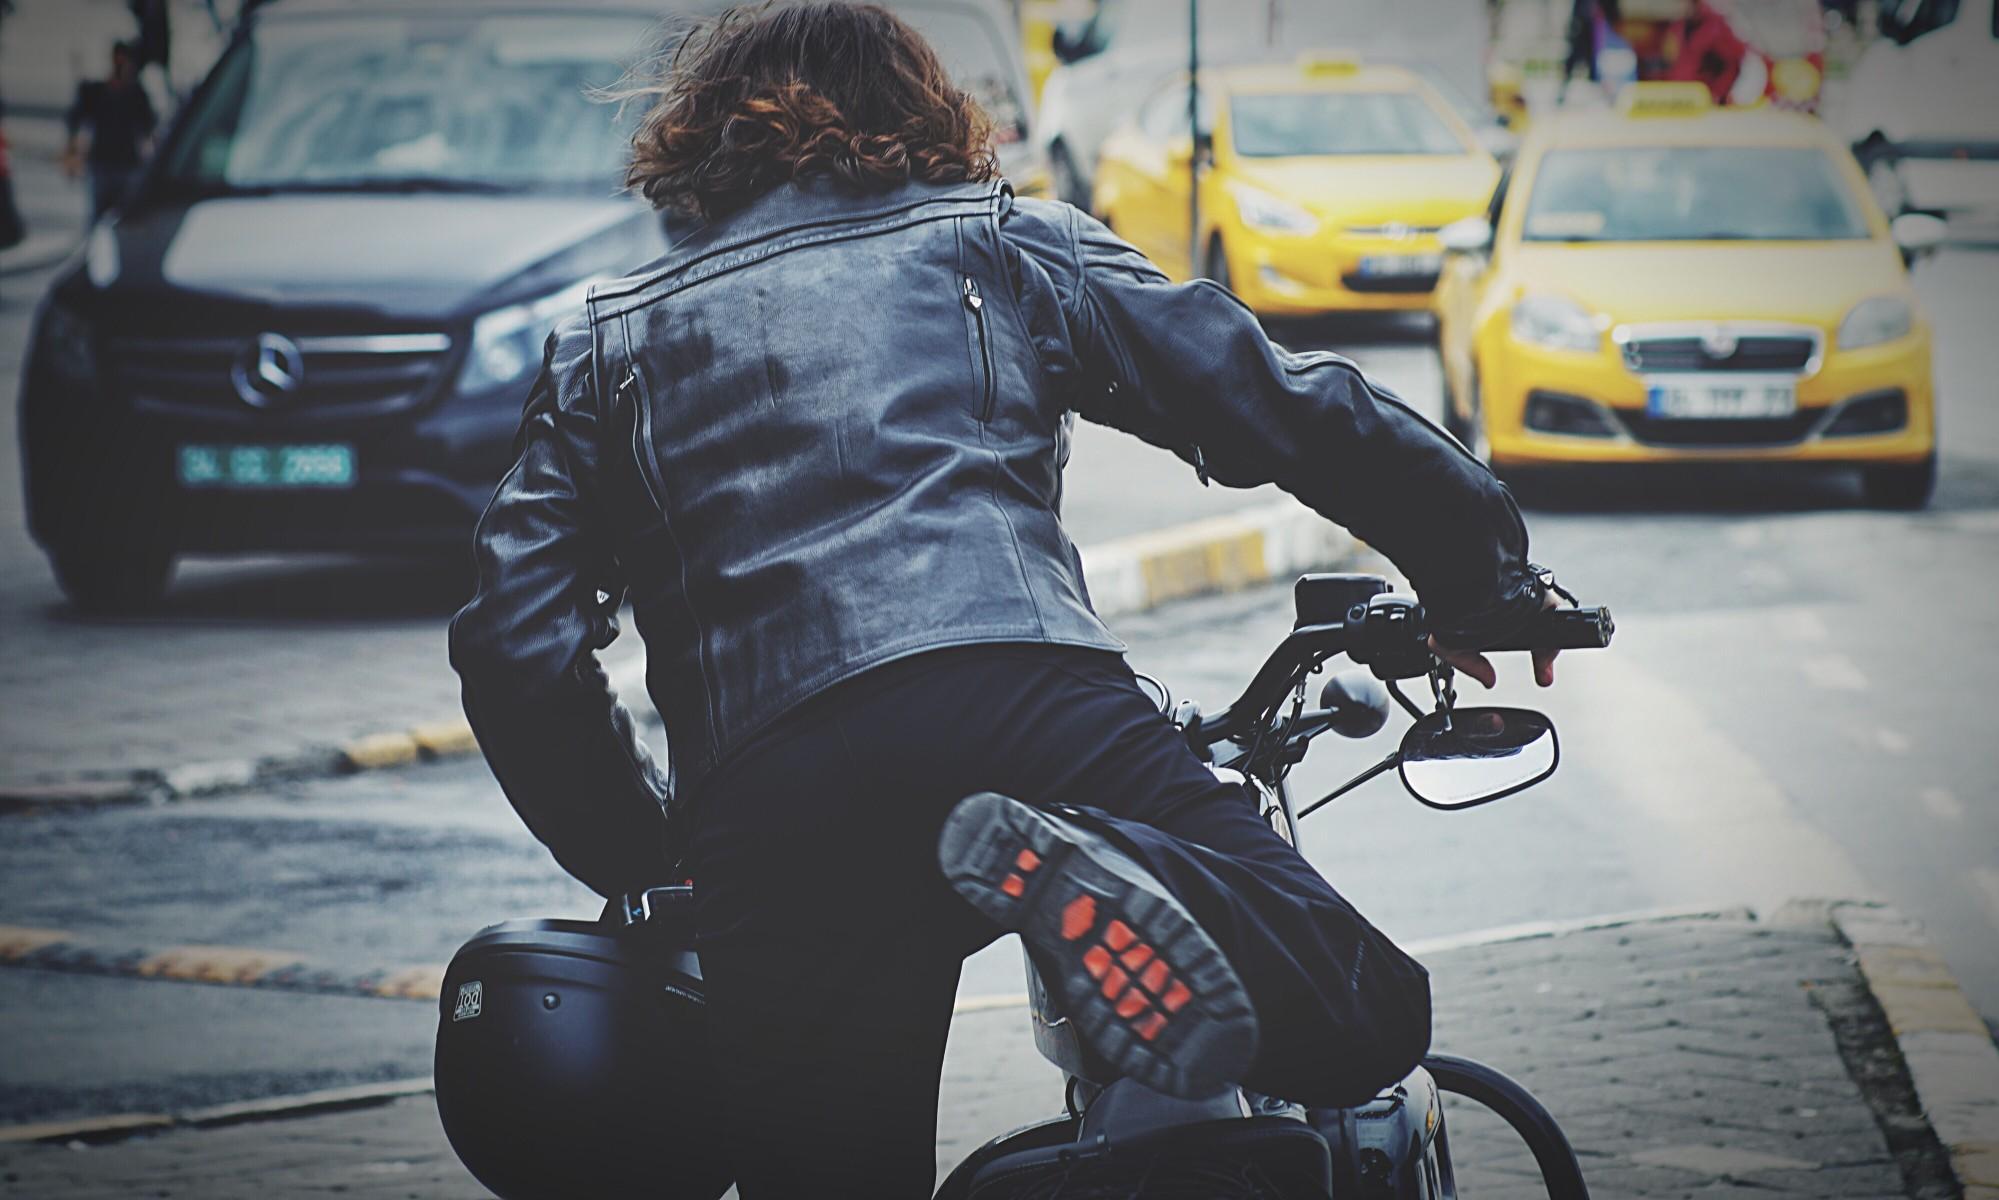 La moto, un véritable plaisir de conduite !